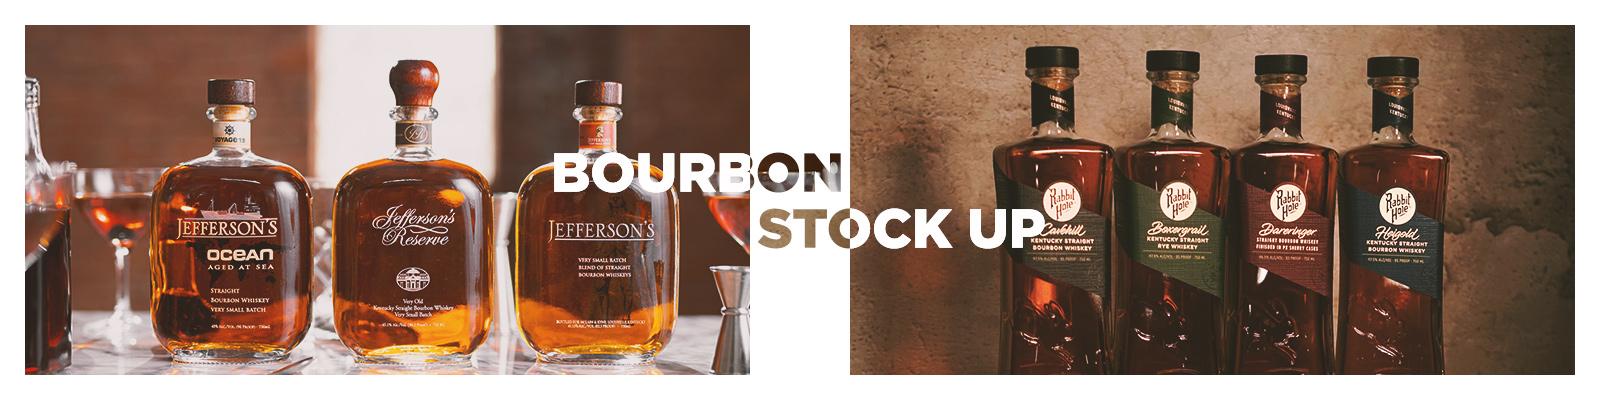 Bourbon Stock Up